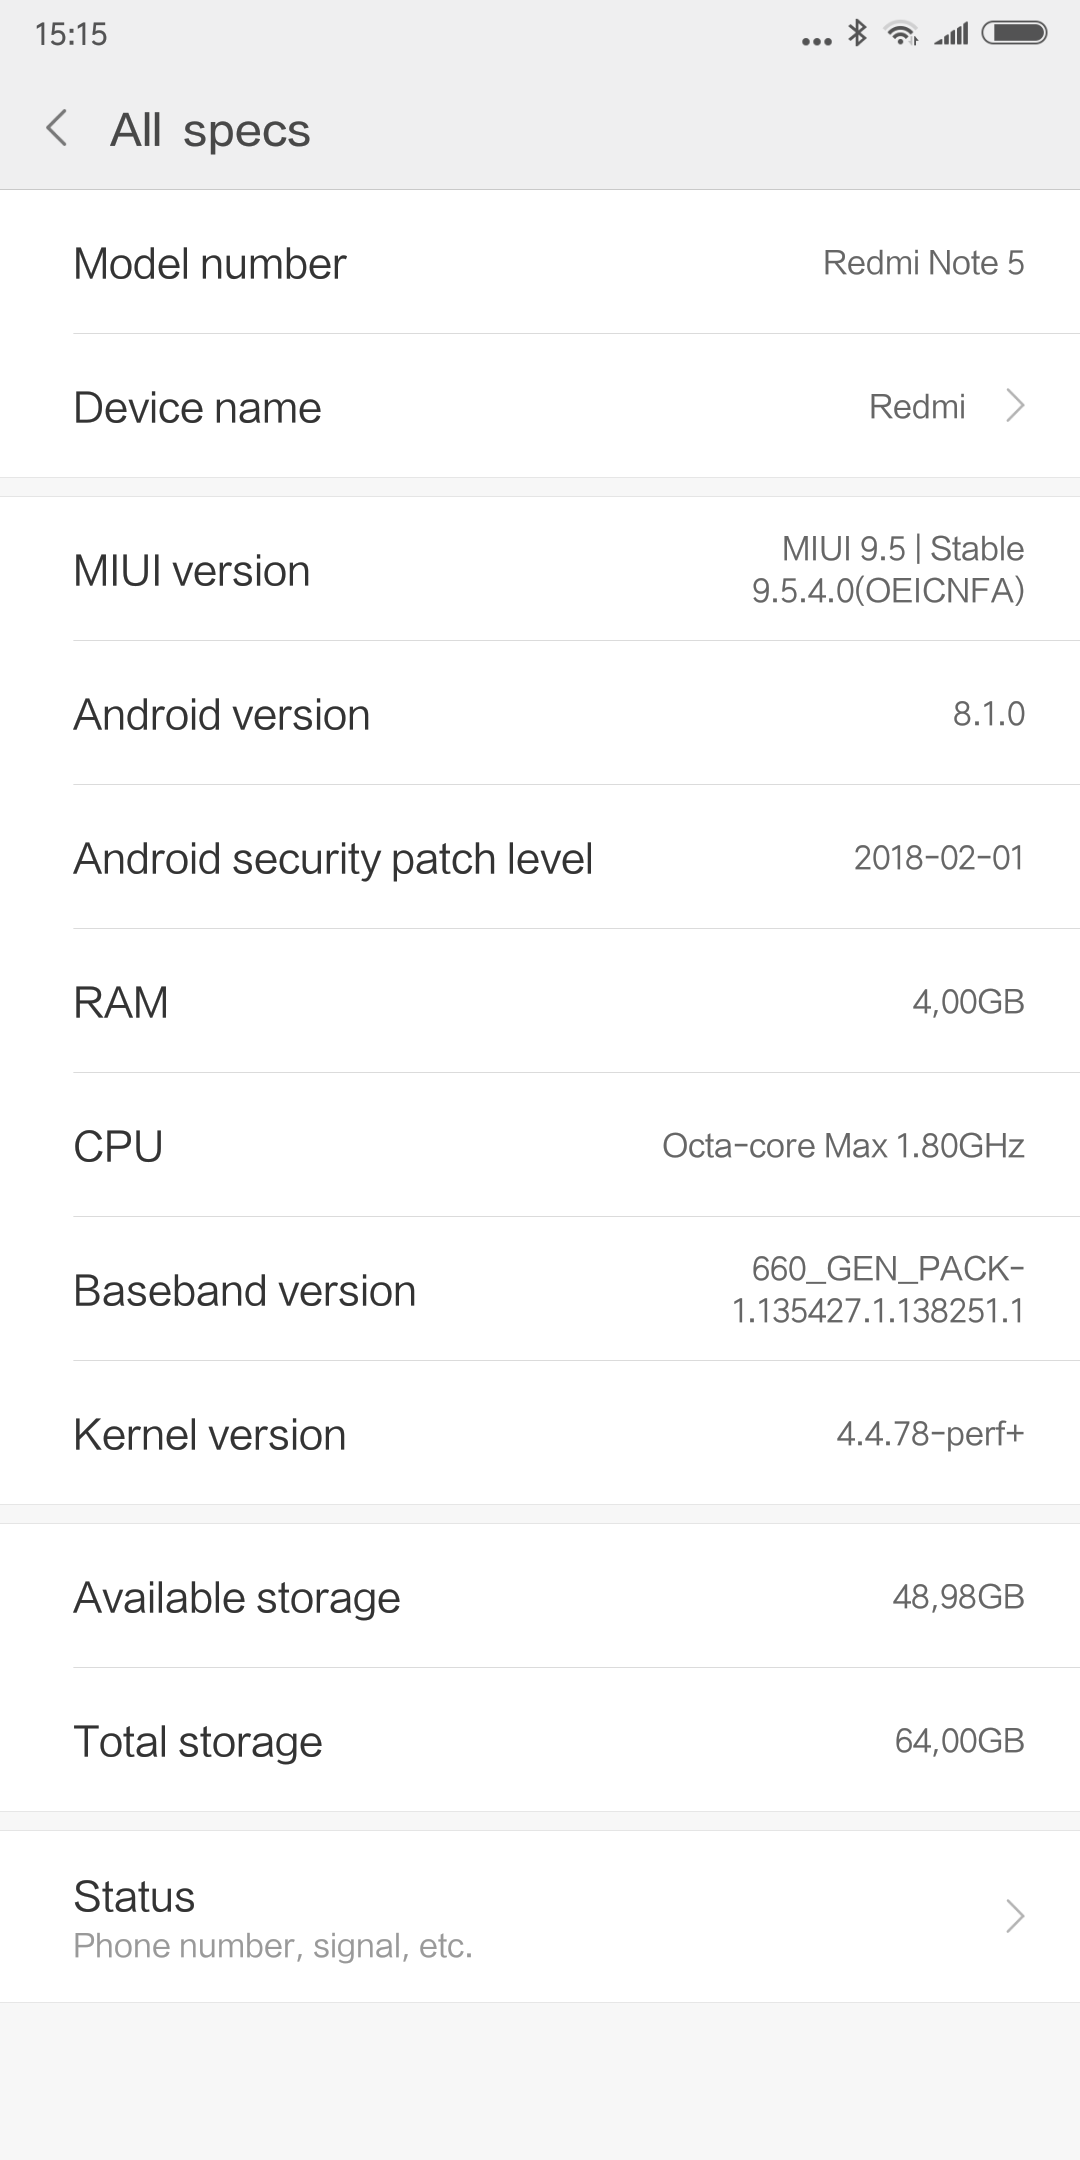 Screenshot 2018 04 02 15 15 02 365 com.android.settings